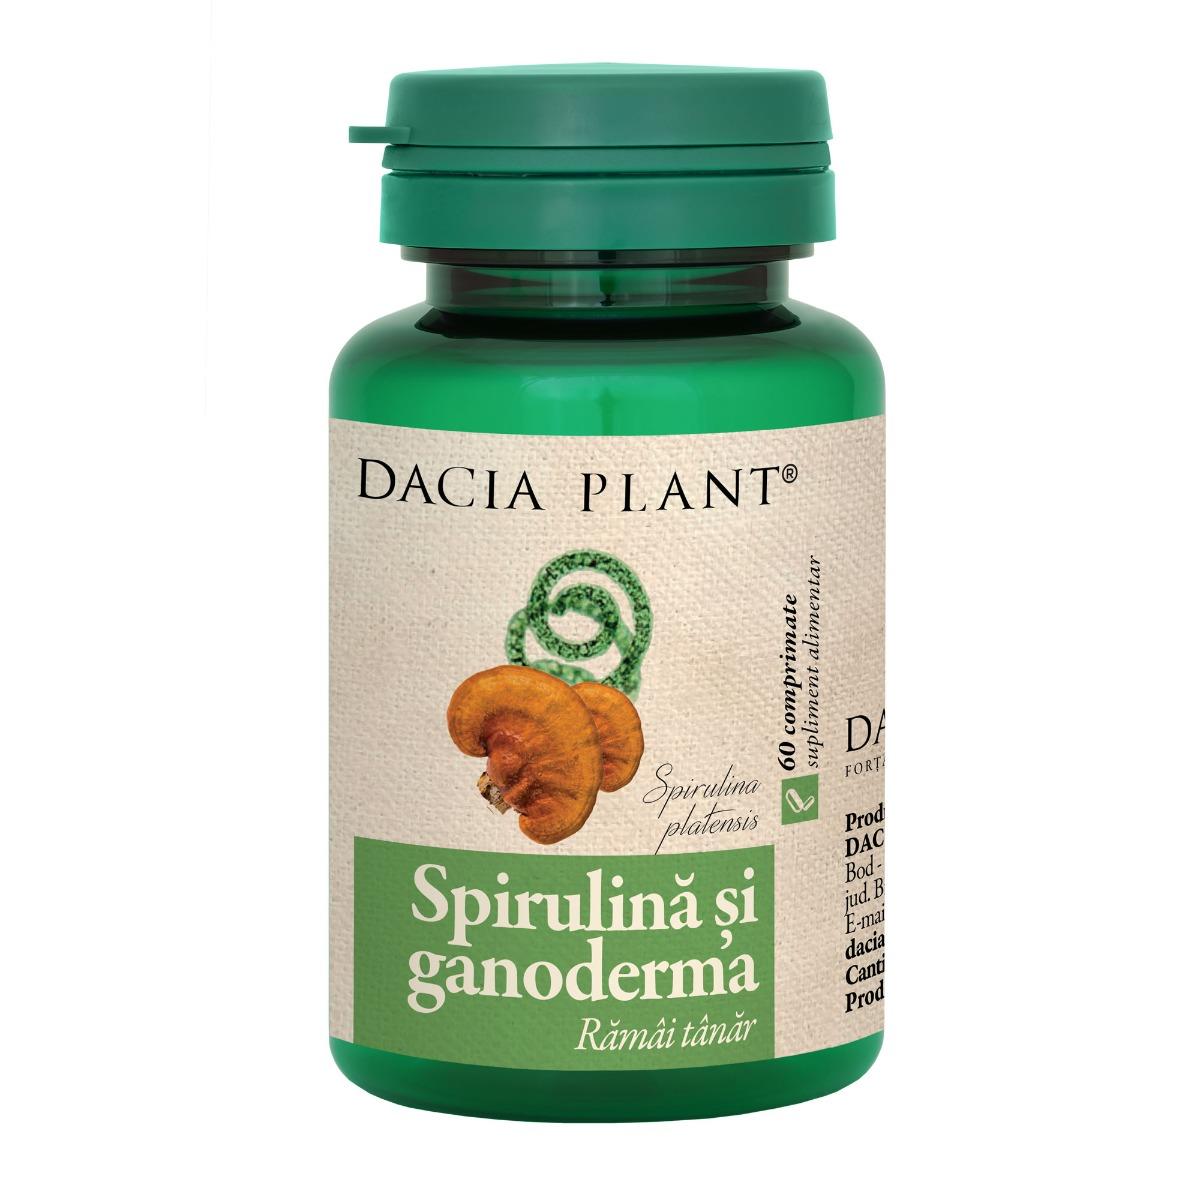 Spirulina si ganoderma, 60 comprimate, Dacia Plant drmax.ro